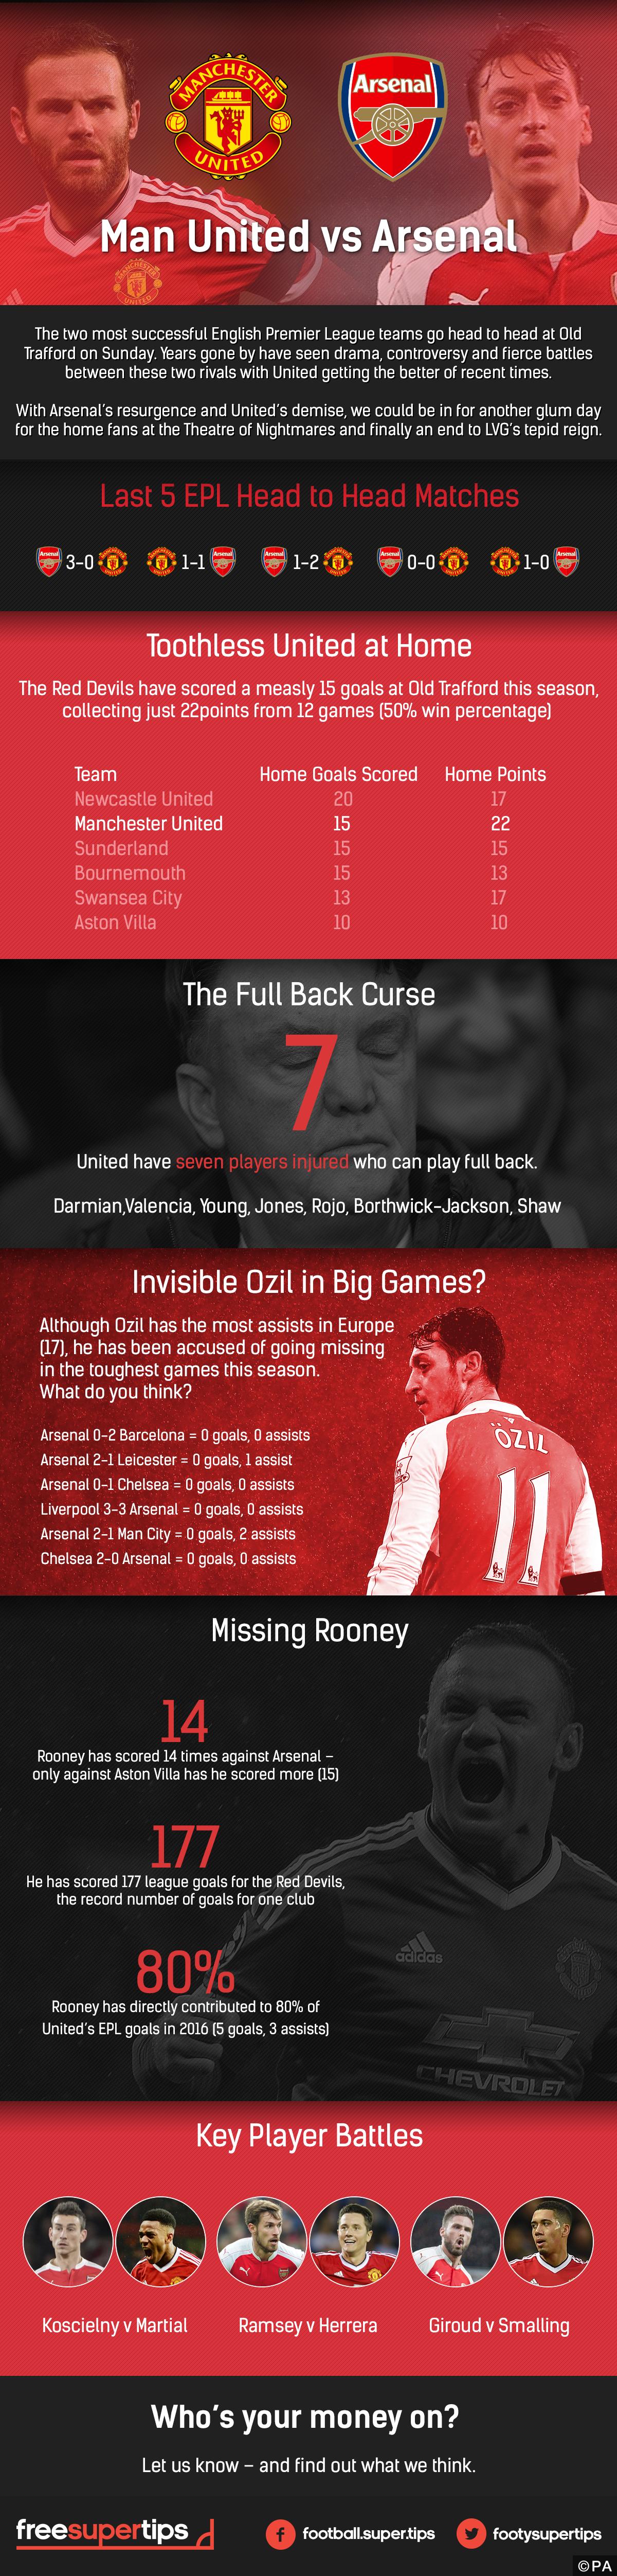 manchester-united-vs-arsenal-infographic